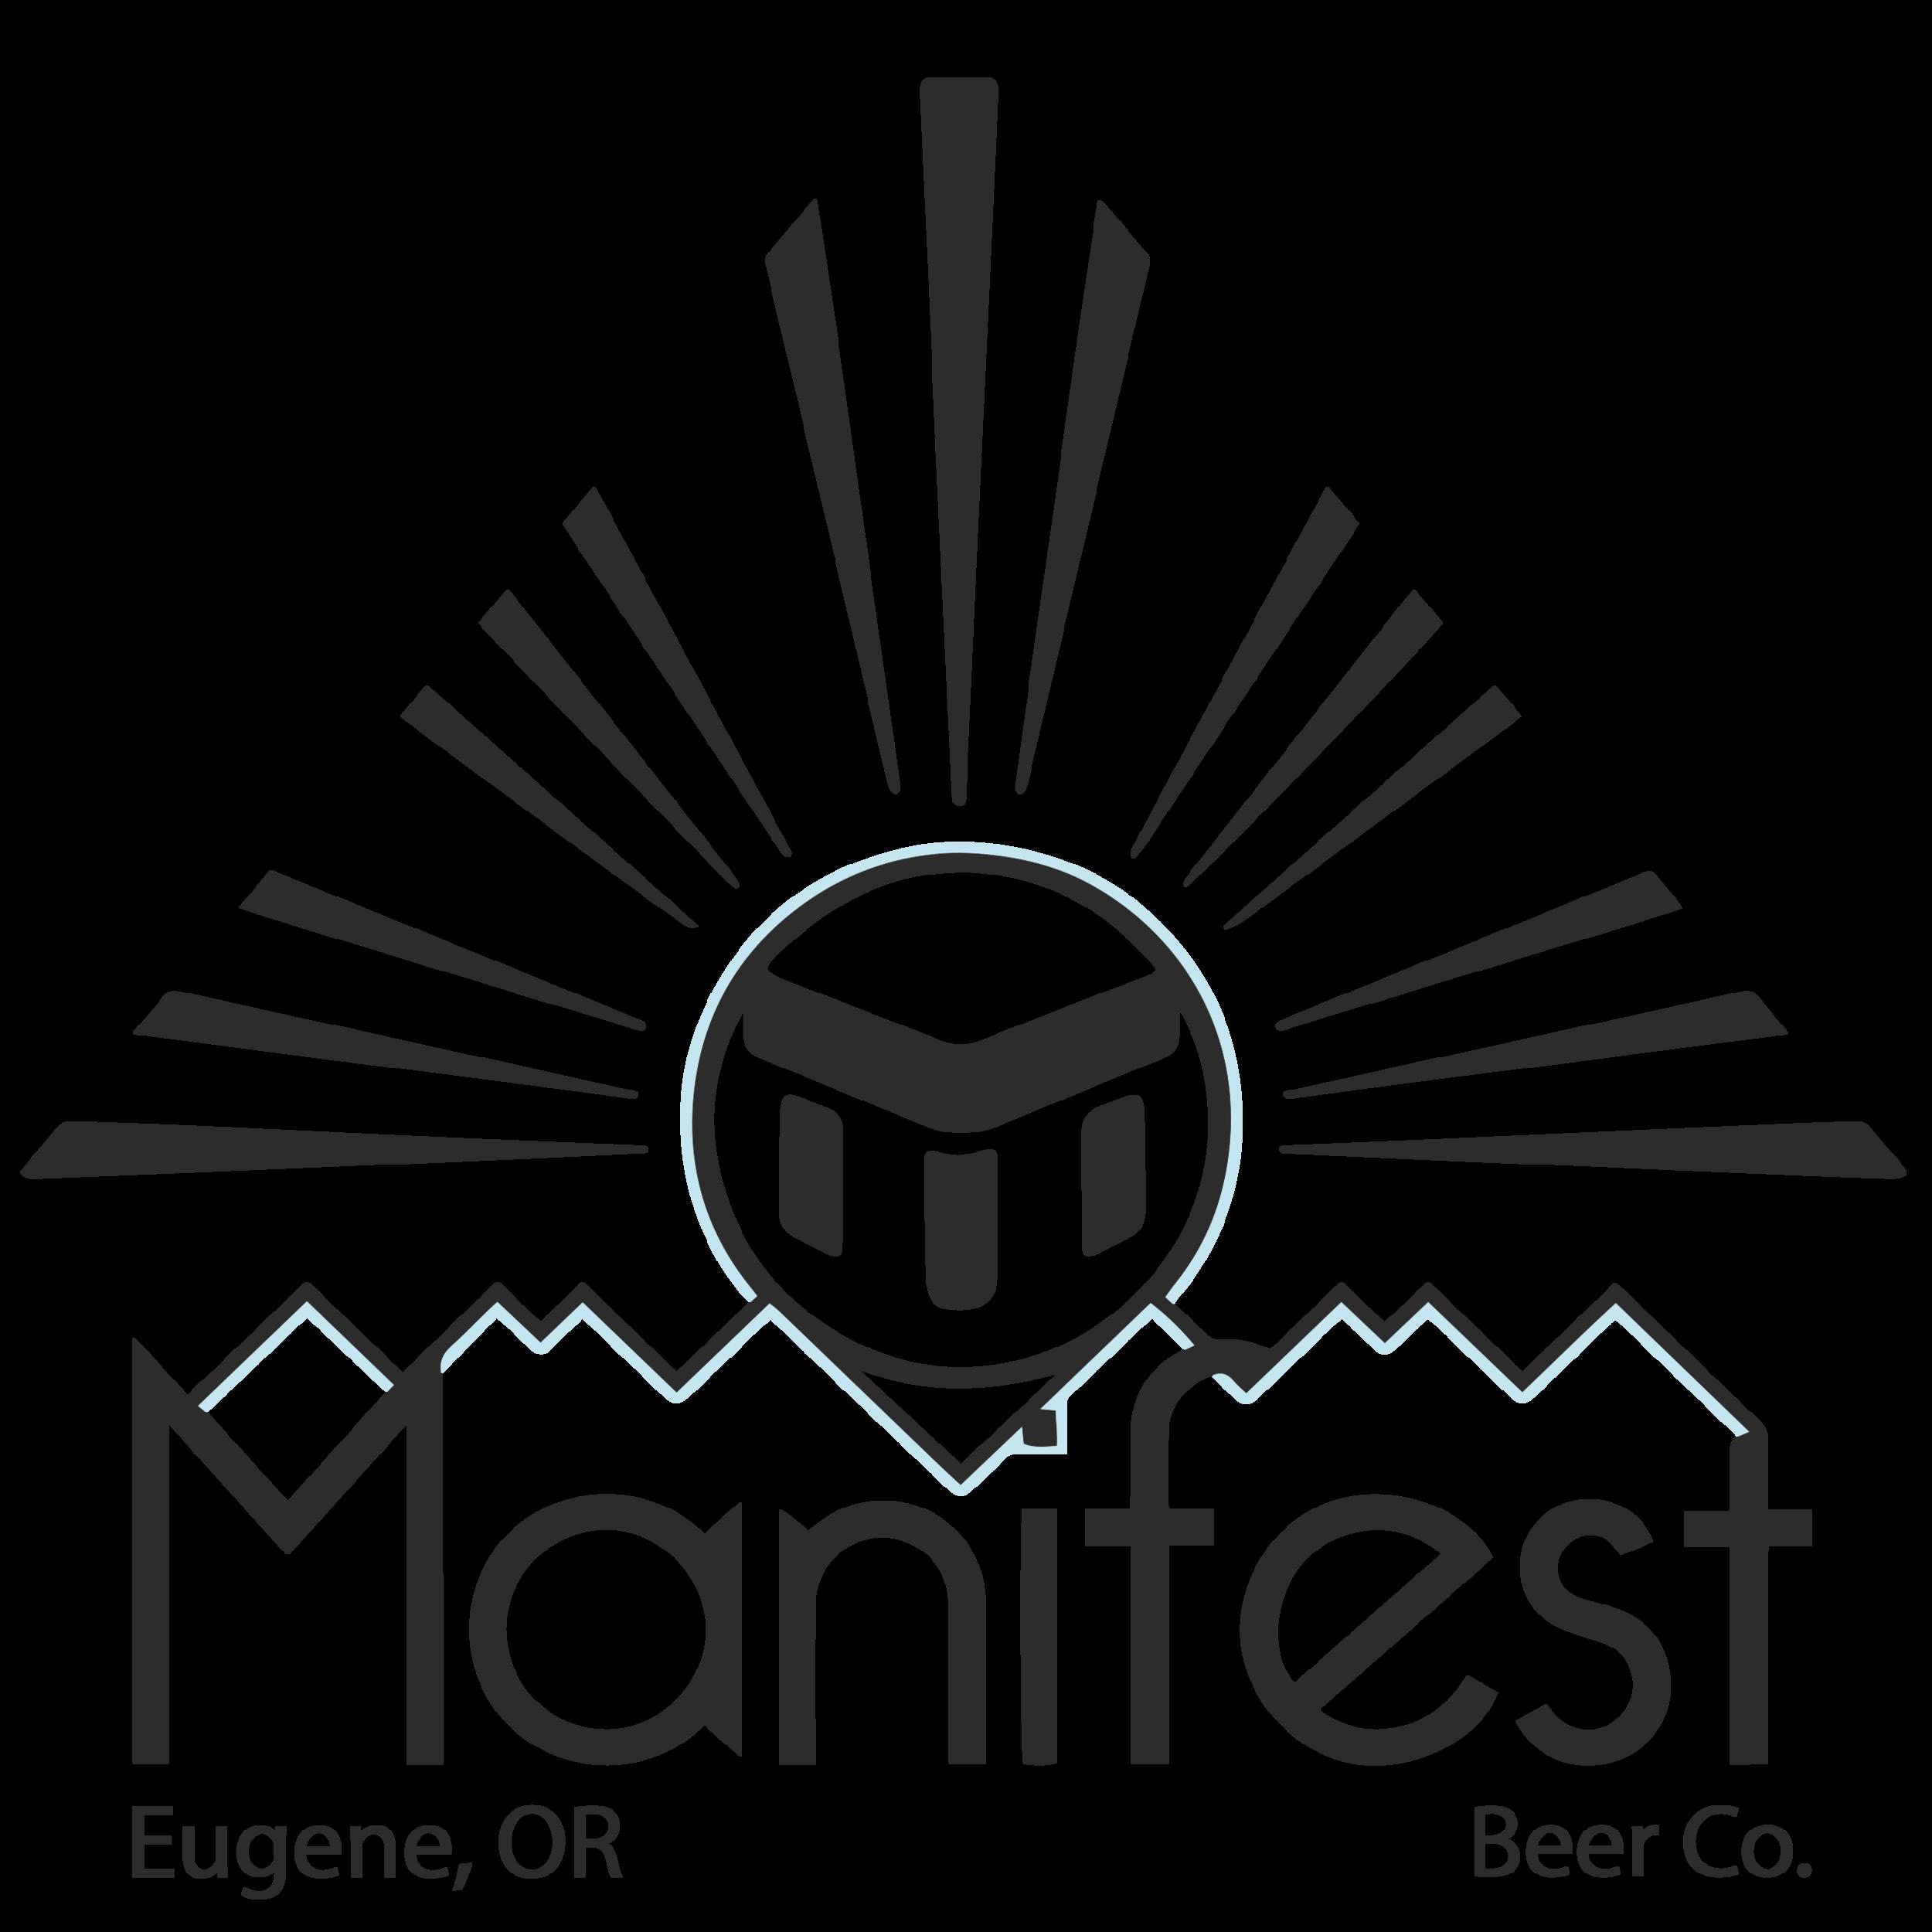 Manifest Beer Company